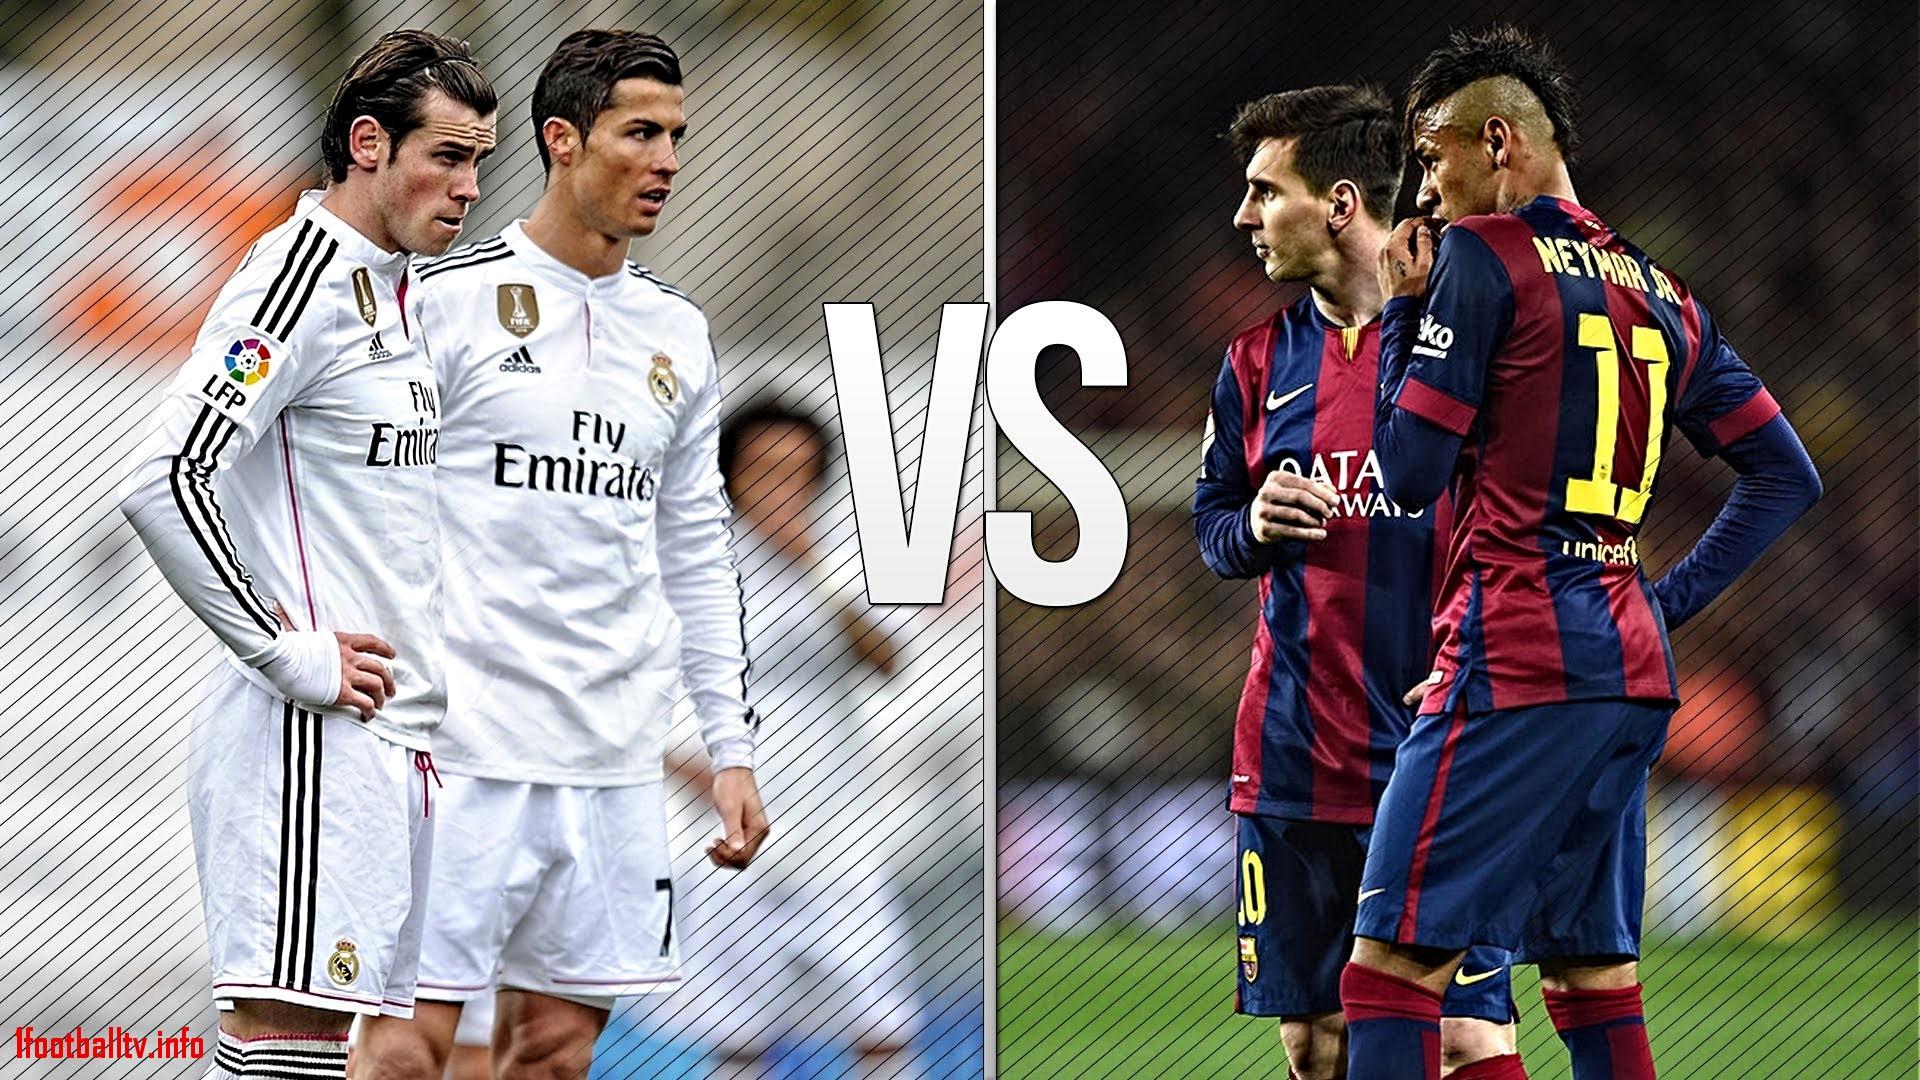 Messi Vs Ronaldo Wallpaper - Cristiano Ronaldo Vs Messi 2018 , HD Wallpaper & Backgrounds